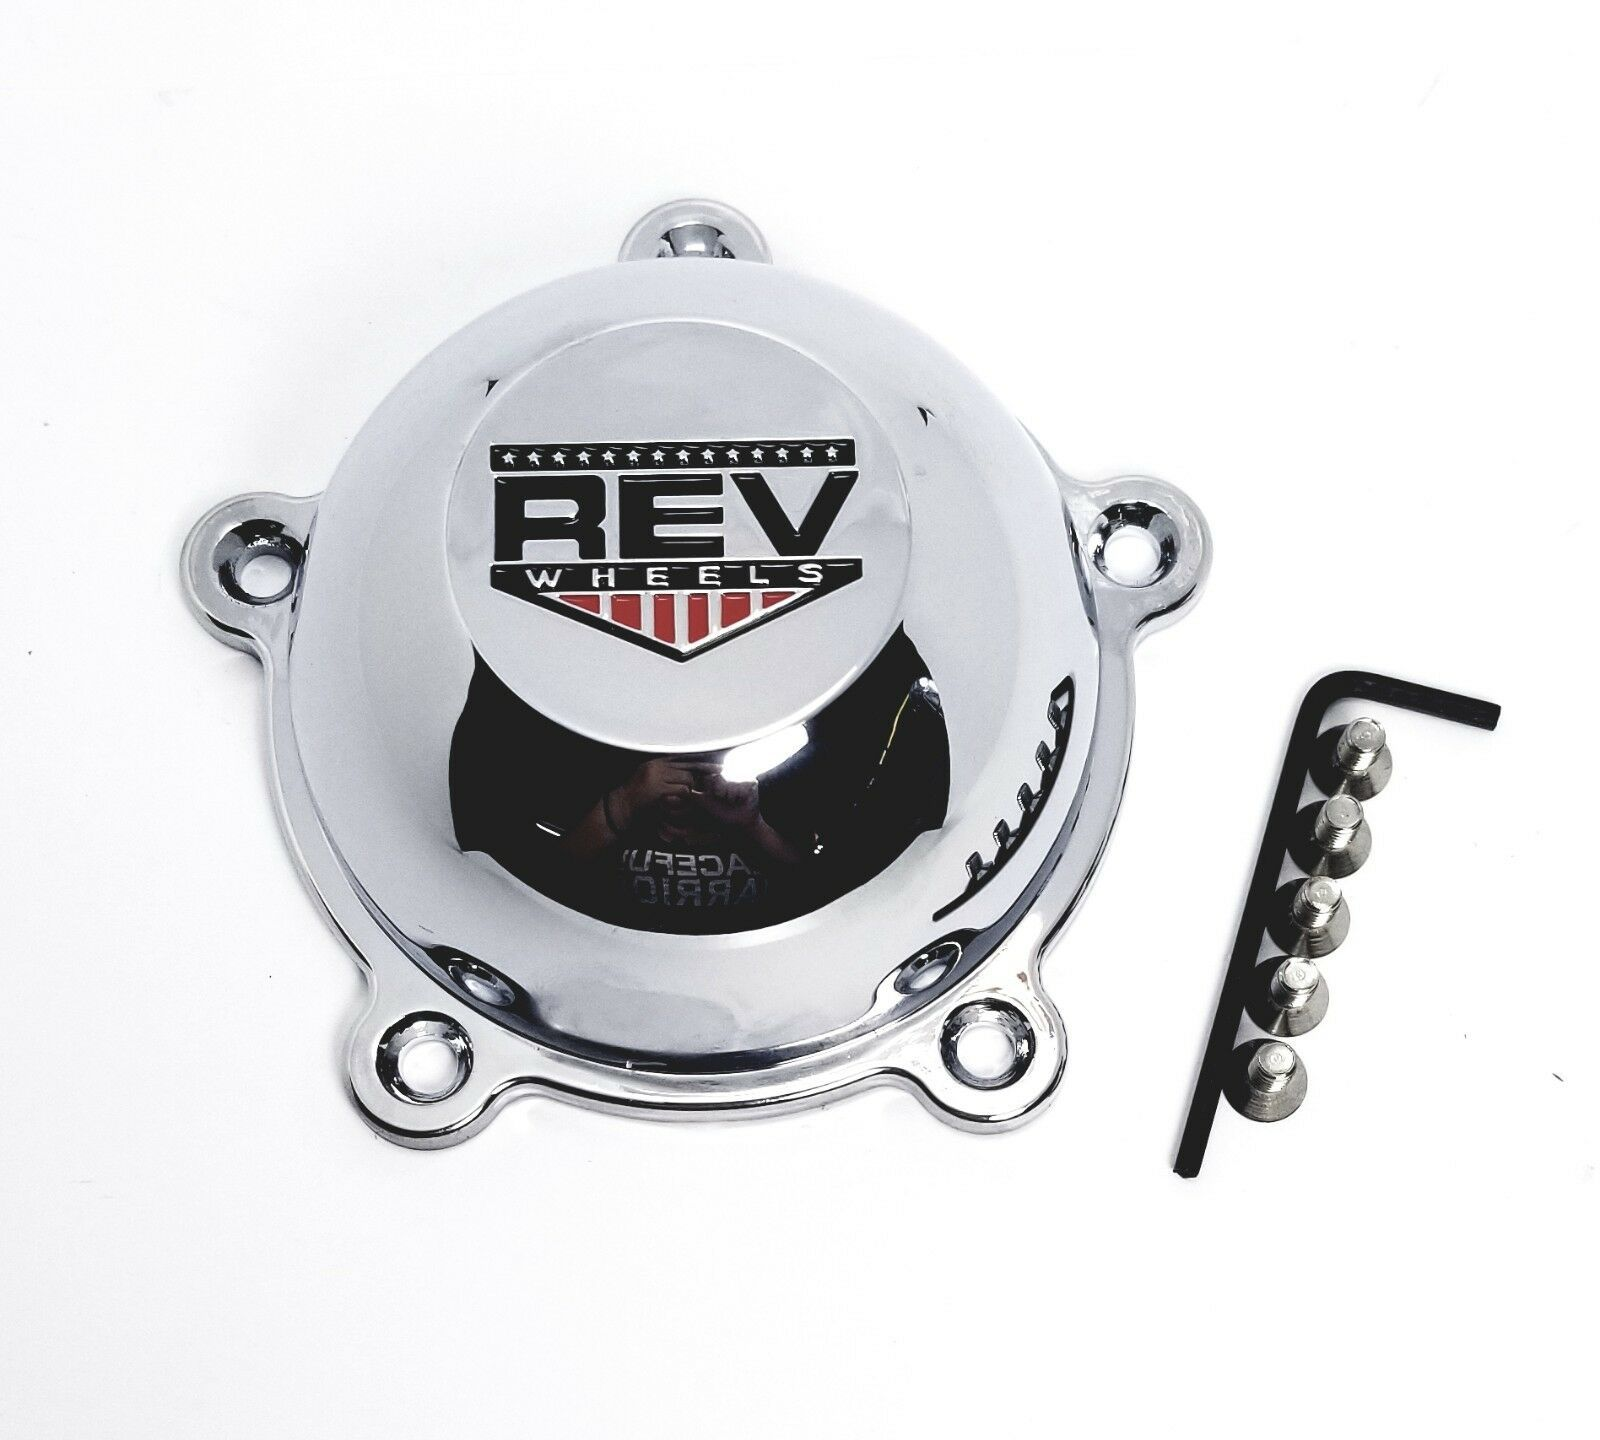 4x American Racing Chrome Bullet Center Hub Caps 5 Ear for Torq Thurst II Wheels